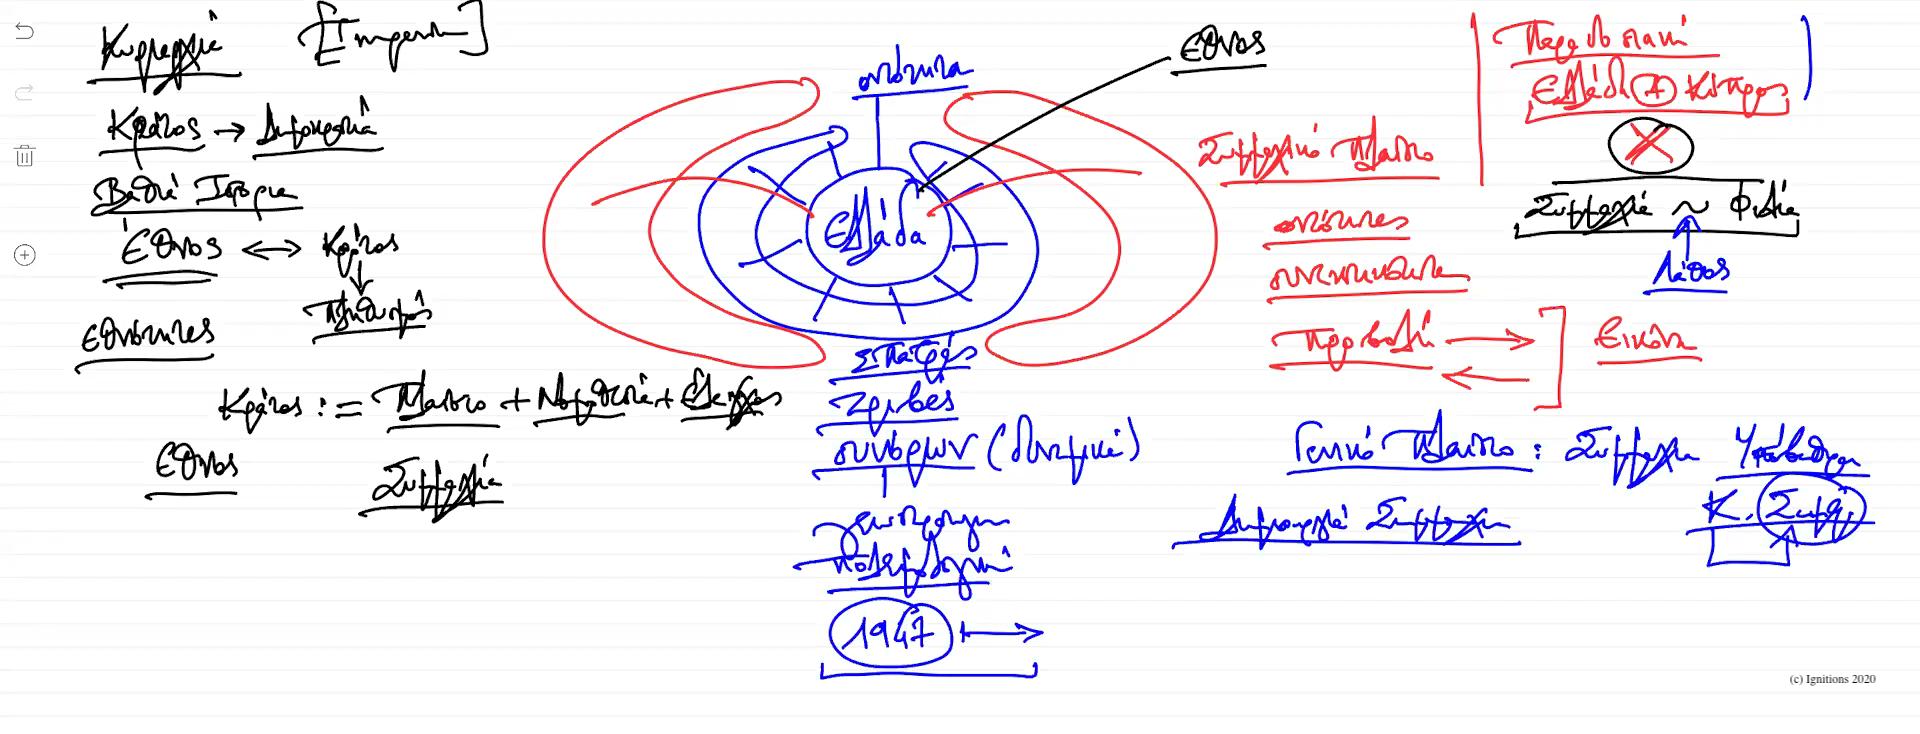 56017 - VII - e-Διάλεξη: Ελληνική Γεωστρατηγική I. (Dessin)